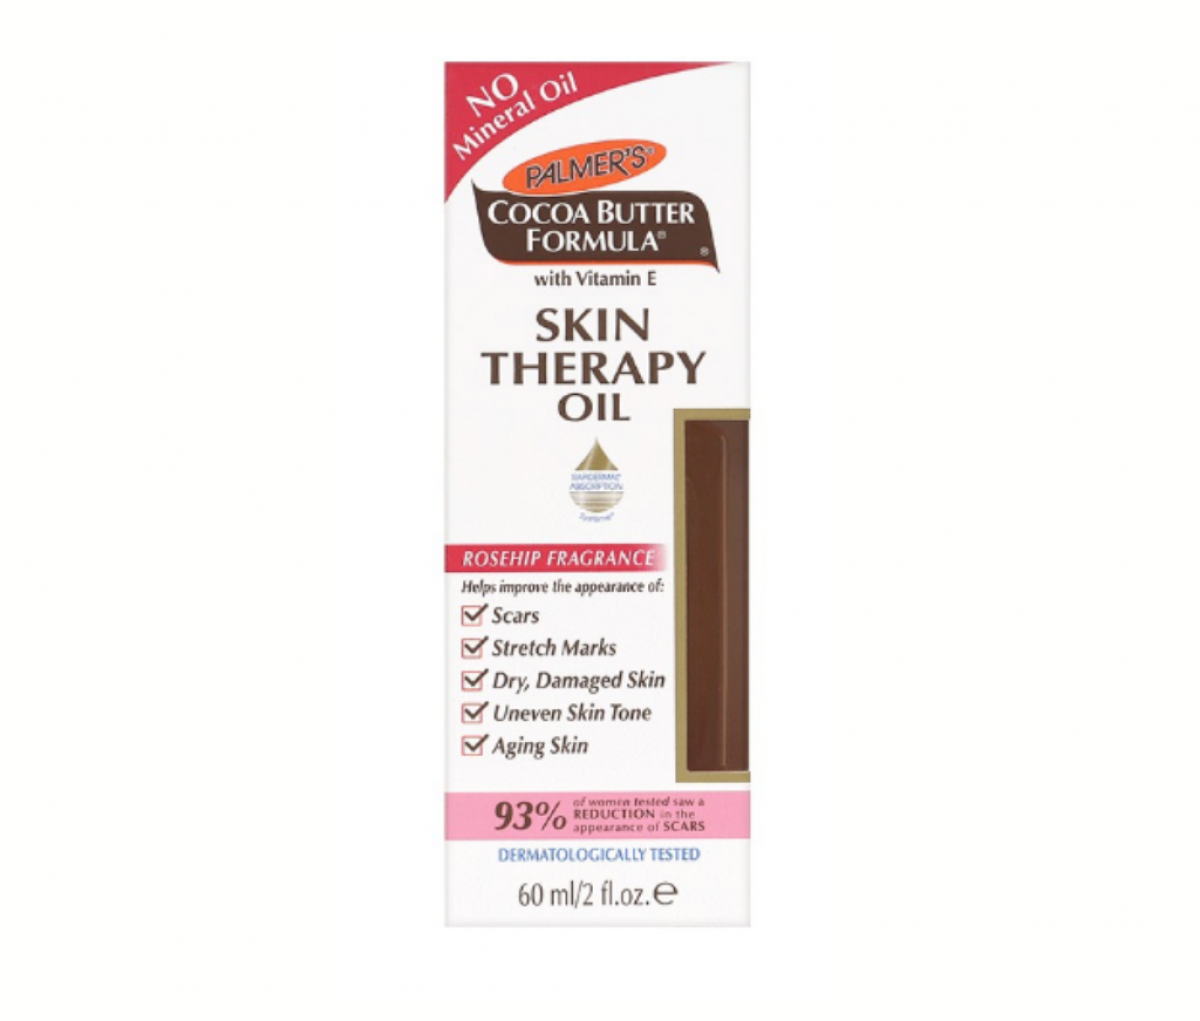 Palmers Cocoa Butter Formula Skin Therapy Oil 60ml